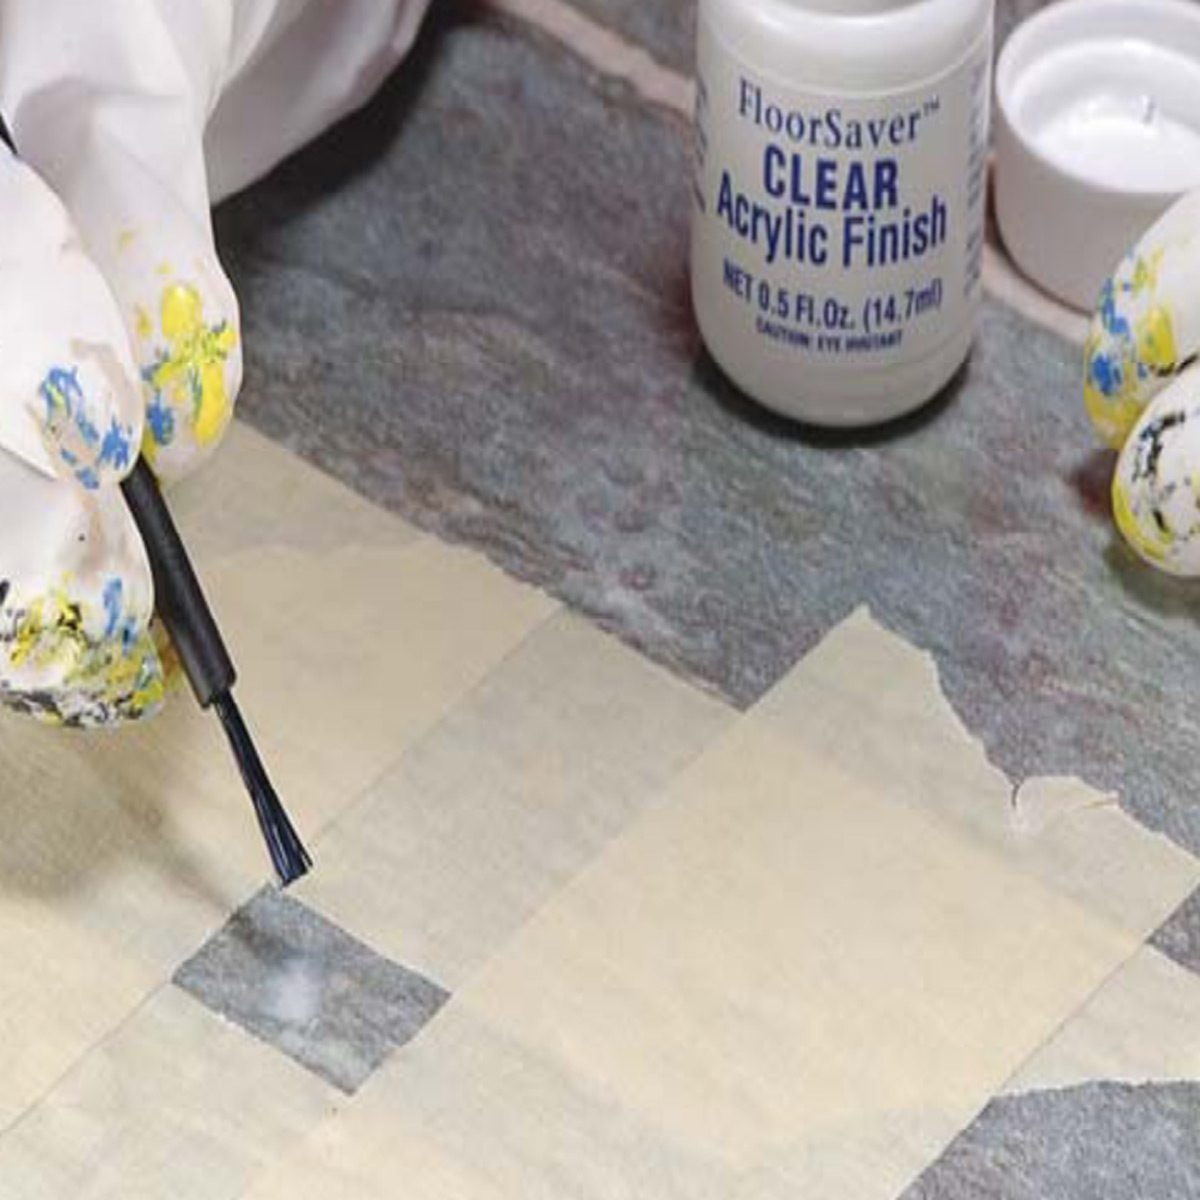 Repairing Vinyl Flooring Diy Family Handyman